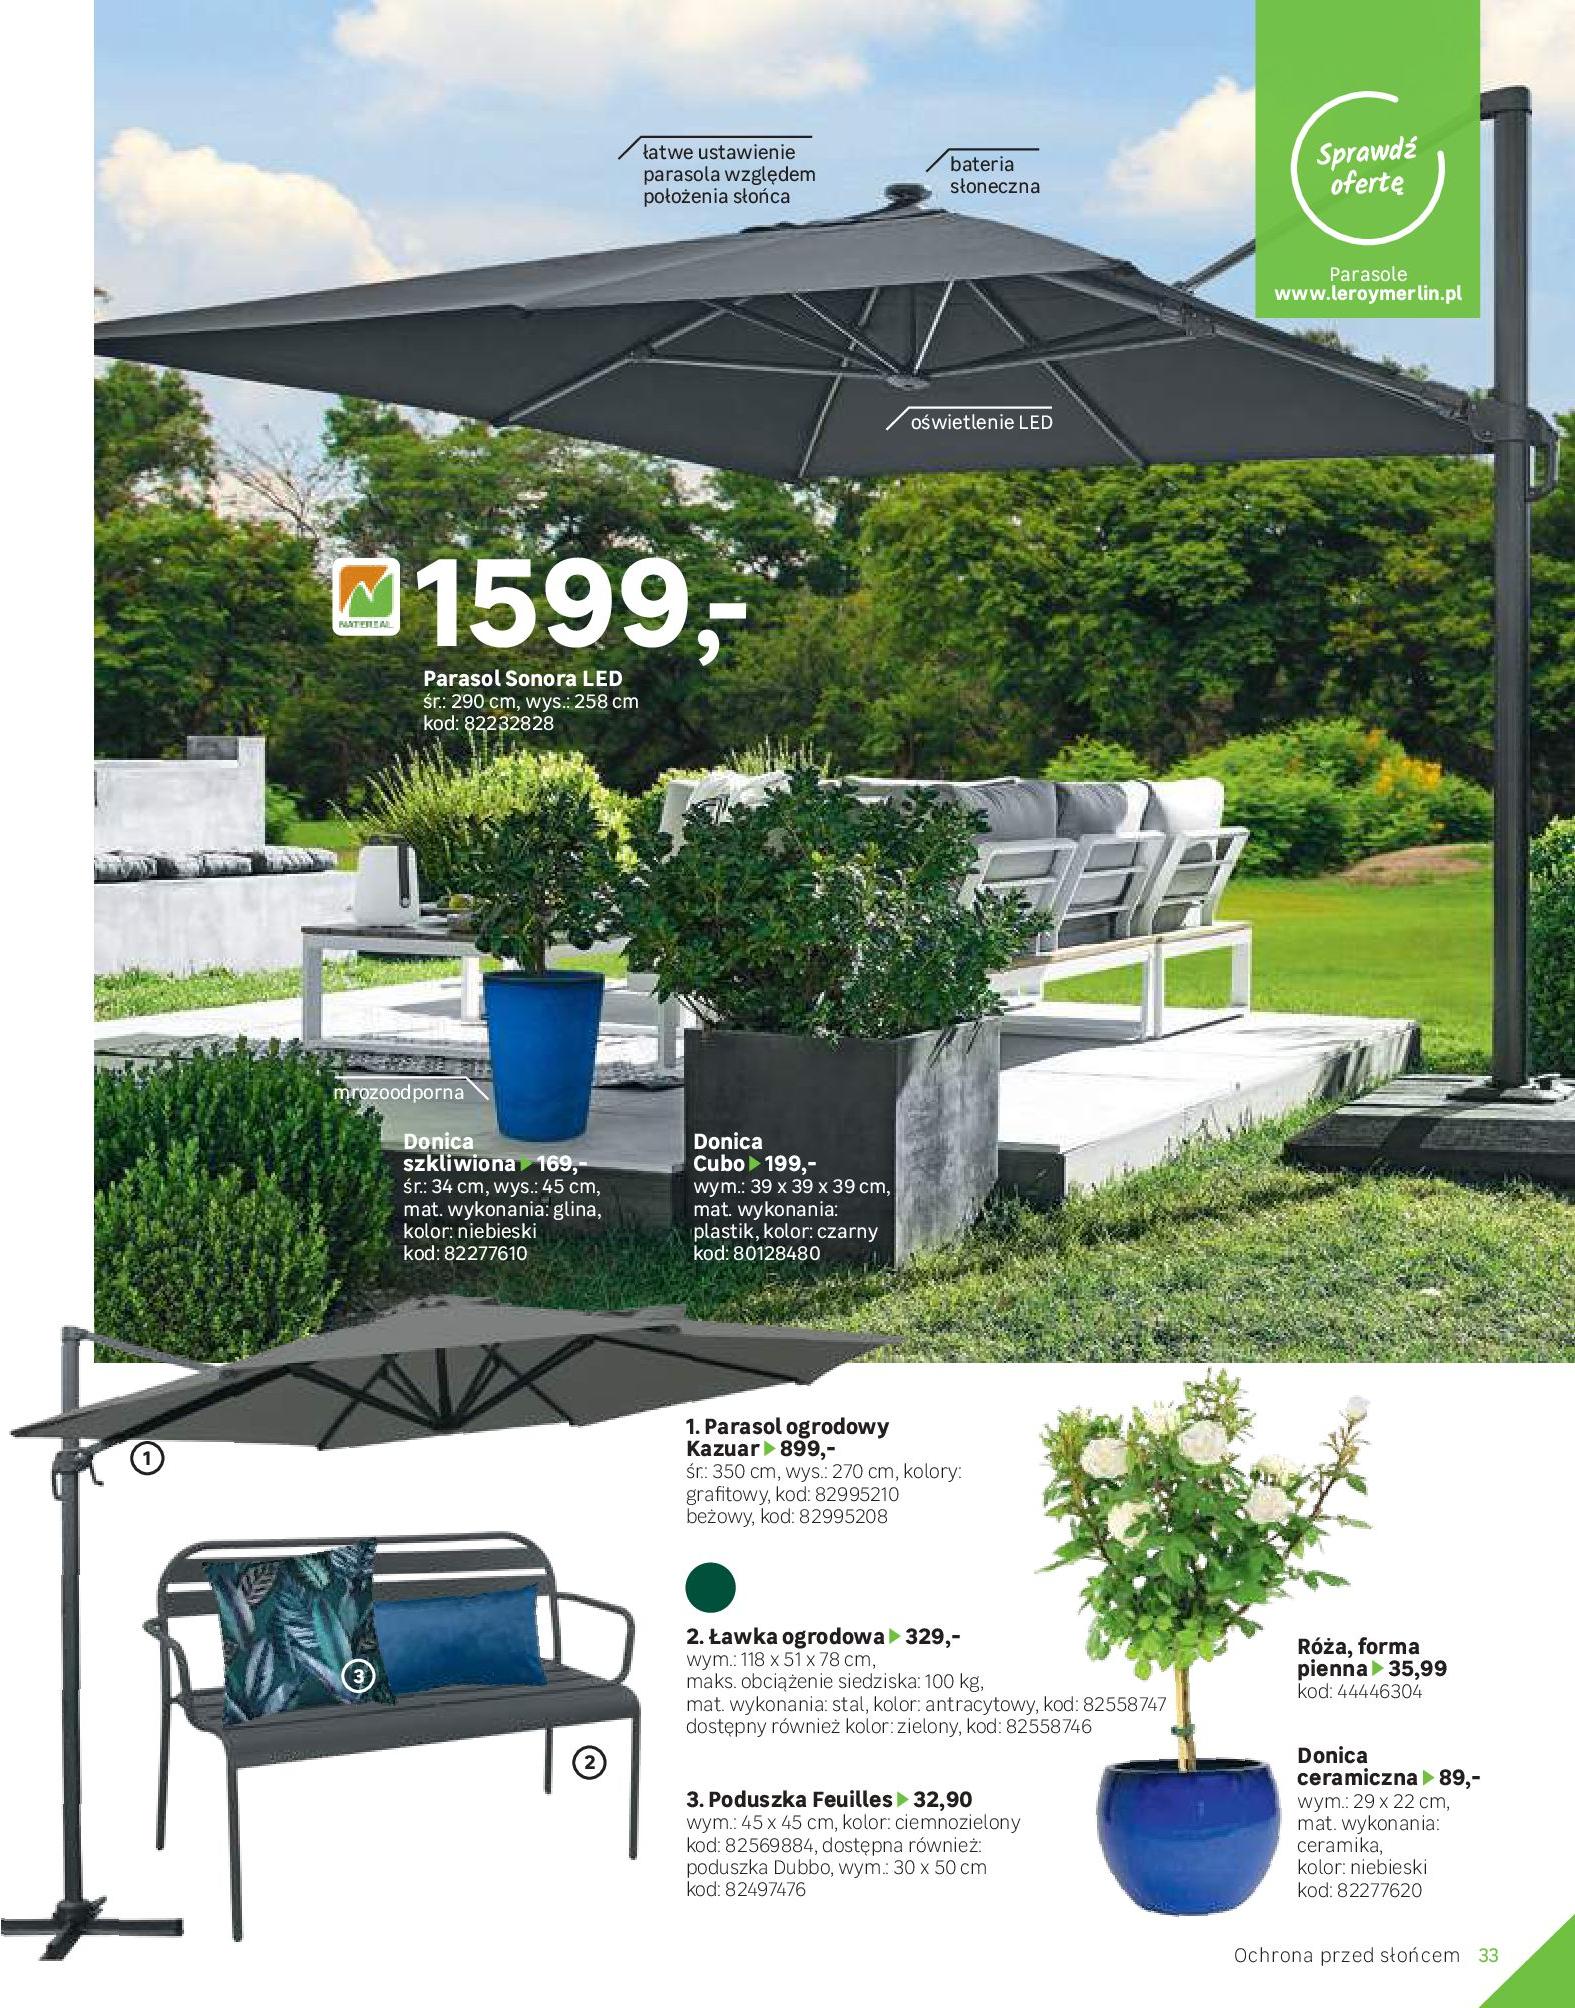 Gazetka Leroy Merlin: Katalog Ogród 2021-03-10 page-33